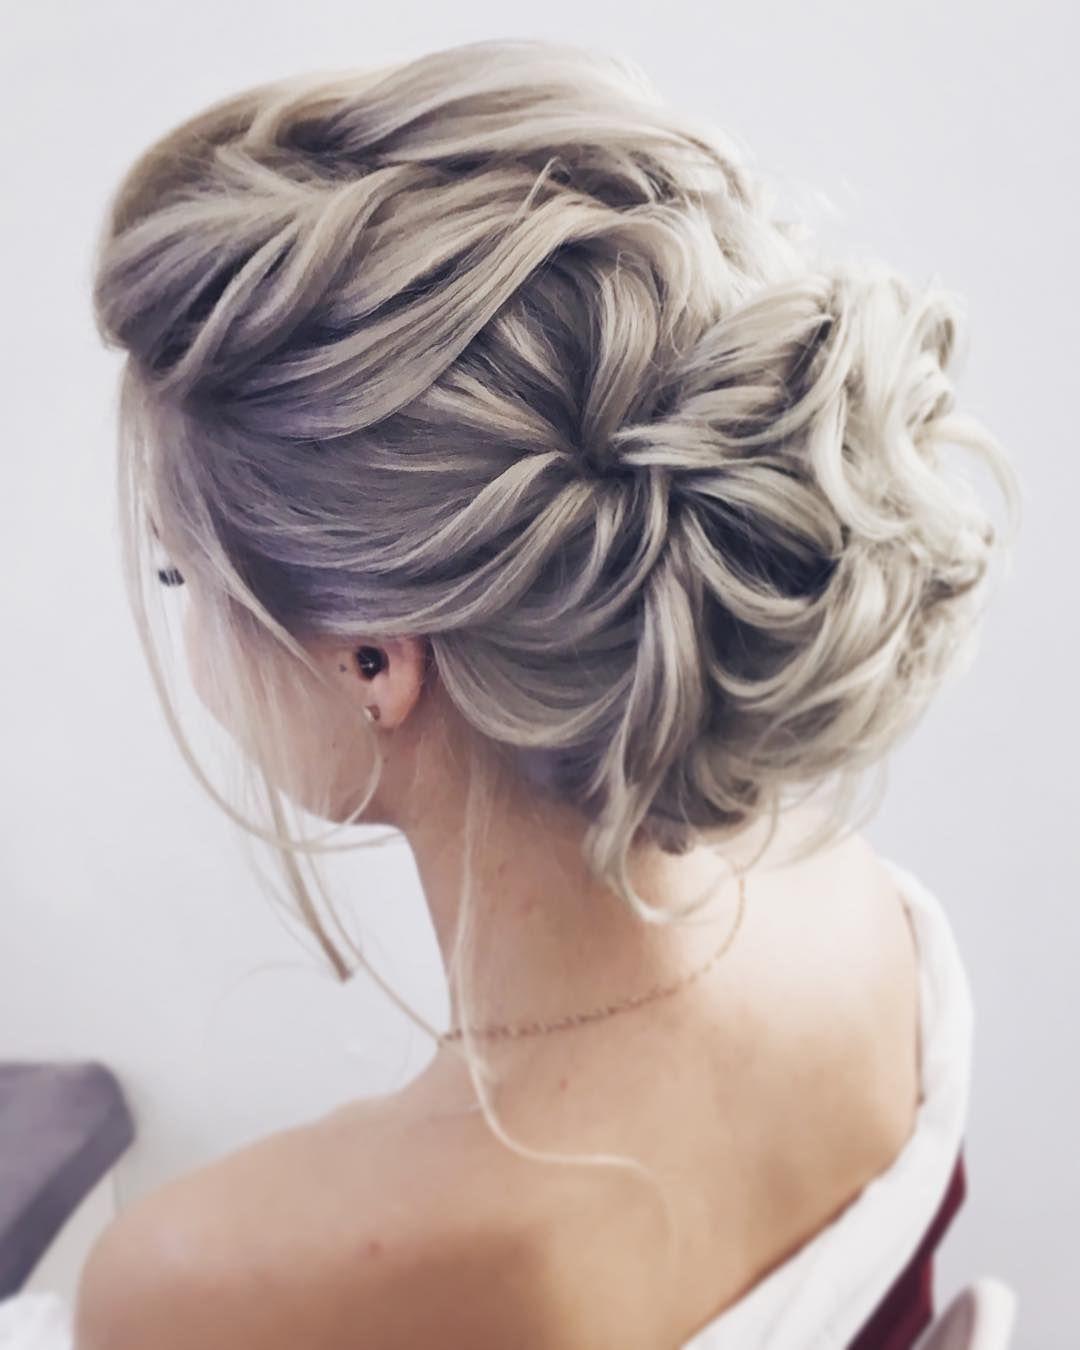 wedding-guest-hair-braid-style-beauty-updo-formal-messy-curly.jpg